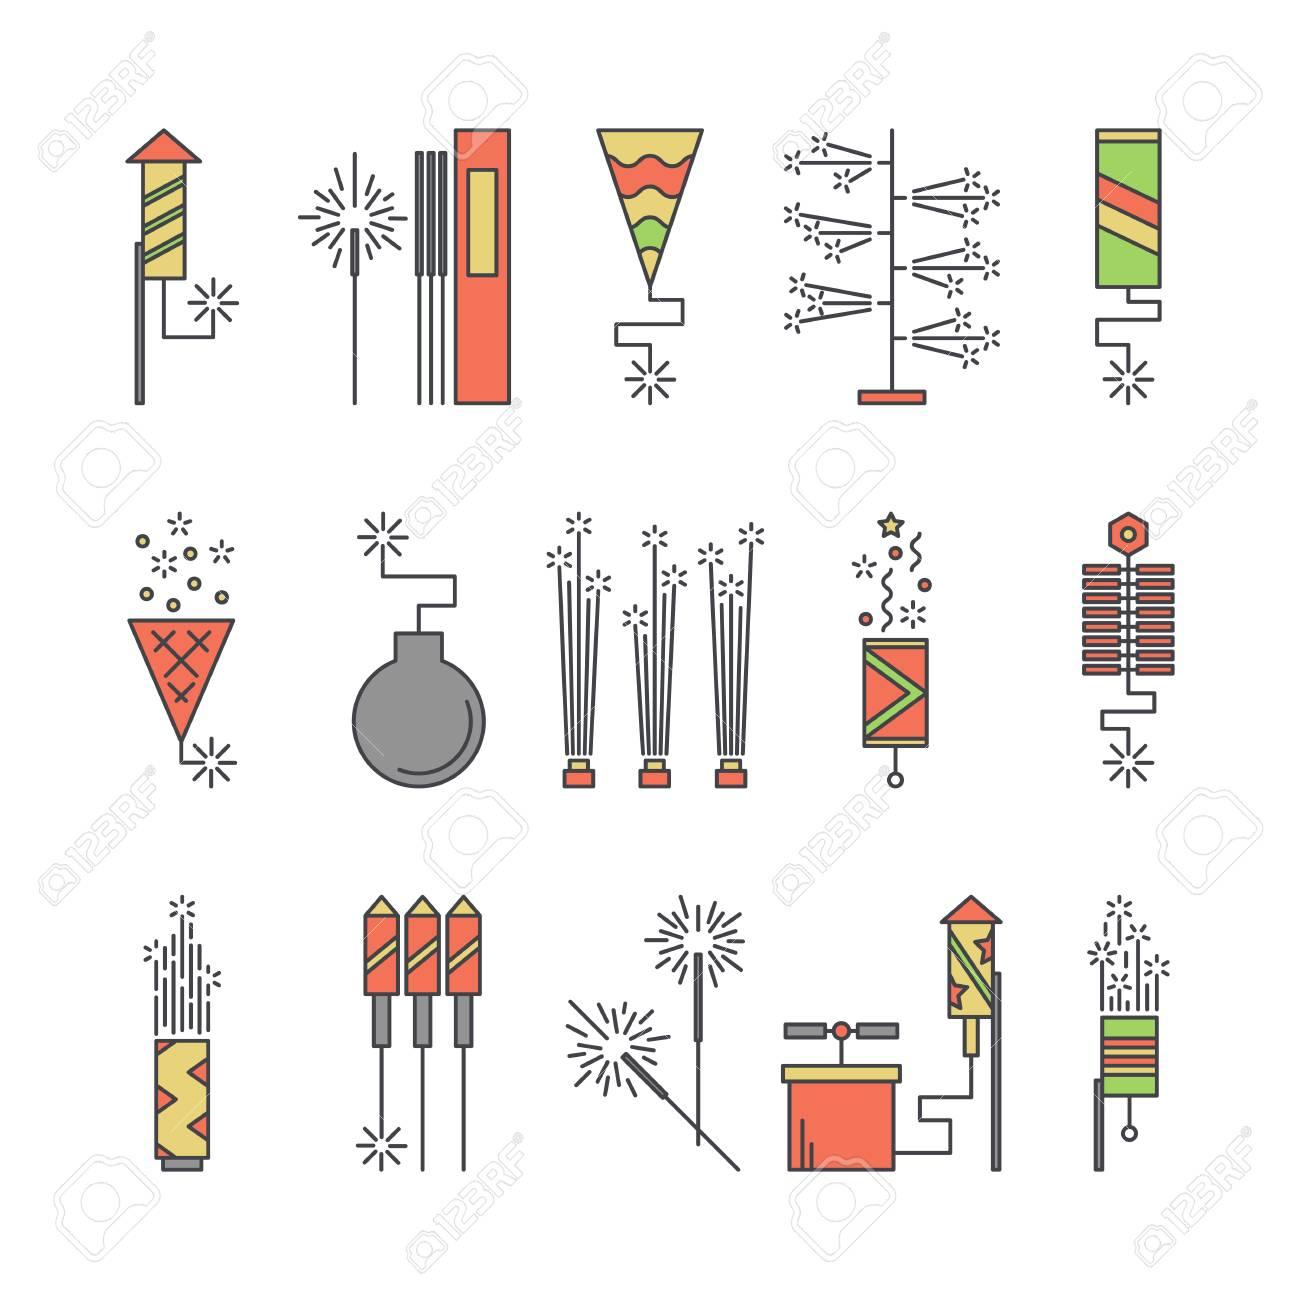 Vector Coloridos Iconos Pirotecnicos Elementos De Explosion De